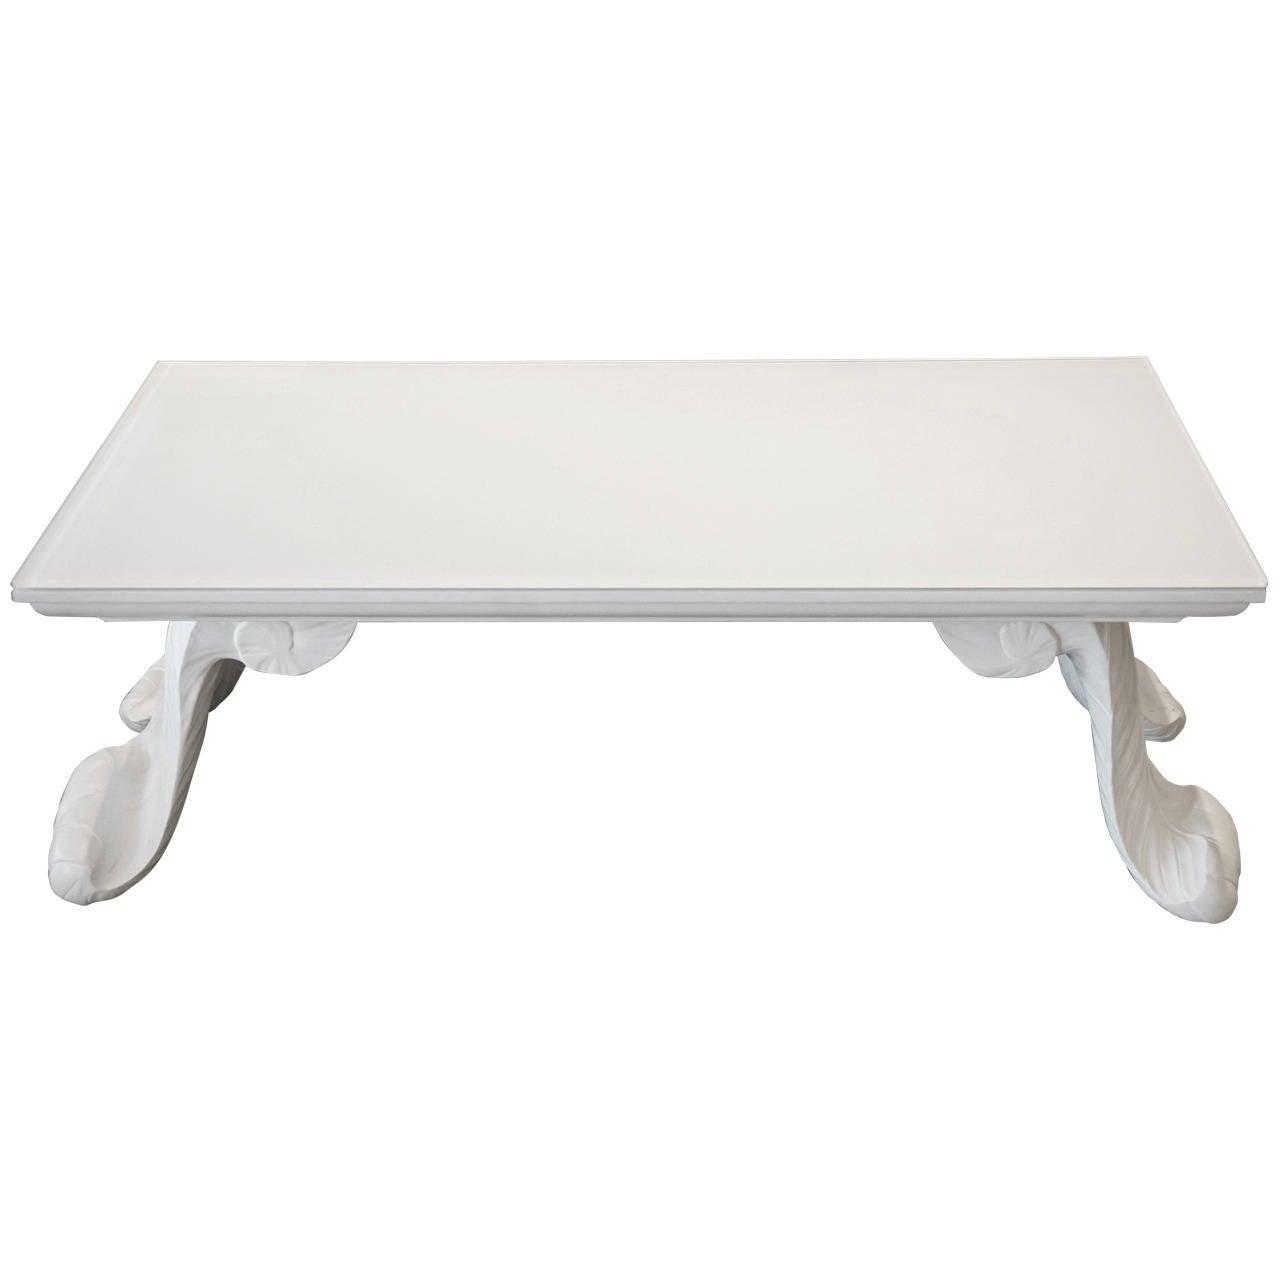 Scroll Leg Coffee Table At 1stdibs